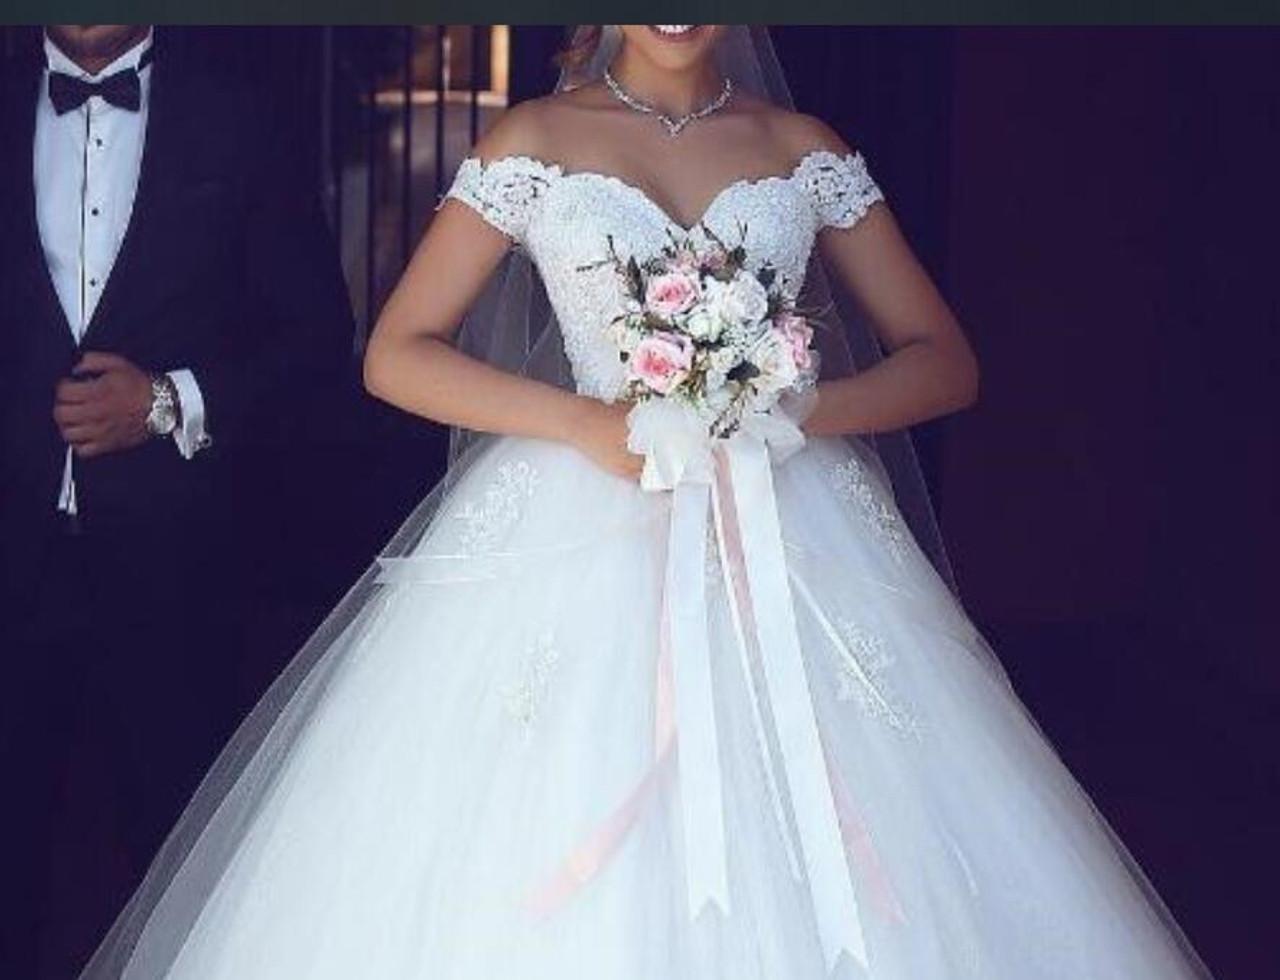 Jieruize White Lace Appliques Ball Gown Cheap Wedding Dresses Off The Shoulder Short Sleeves Bridal Dresses Wedding Gowns Onshopdeals Com